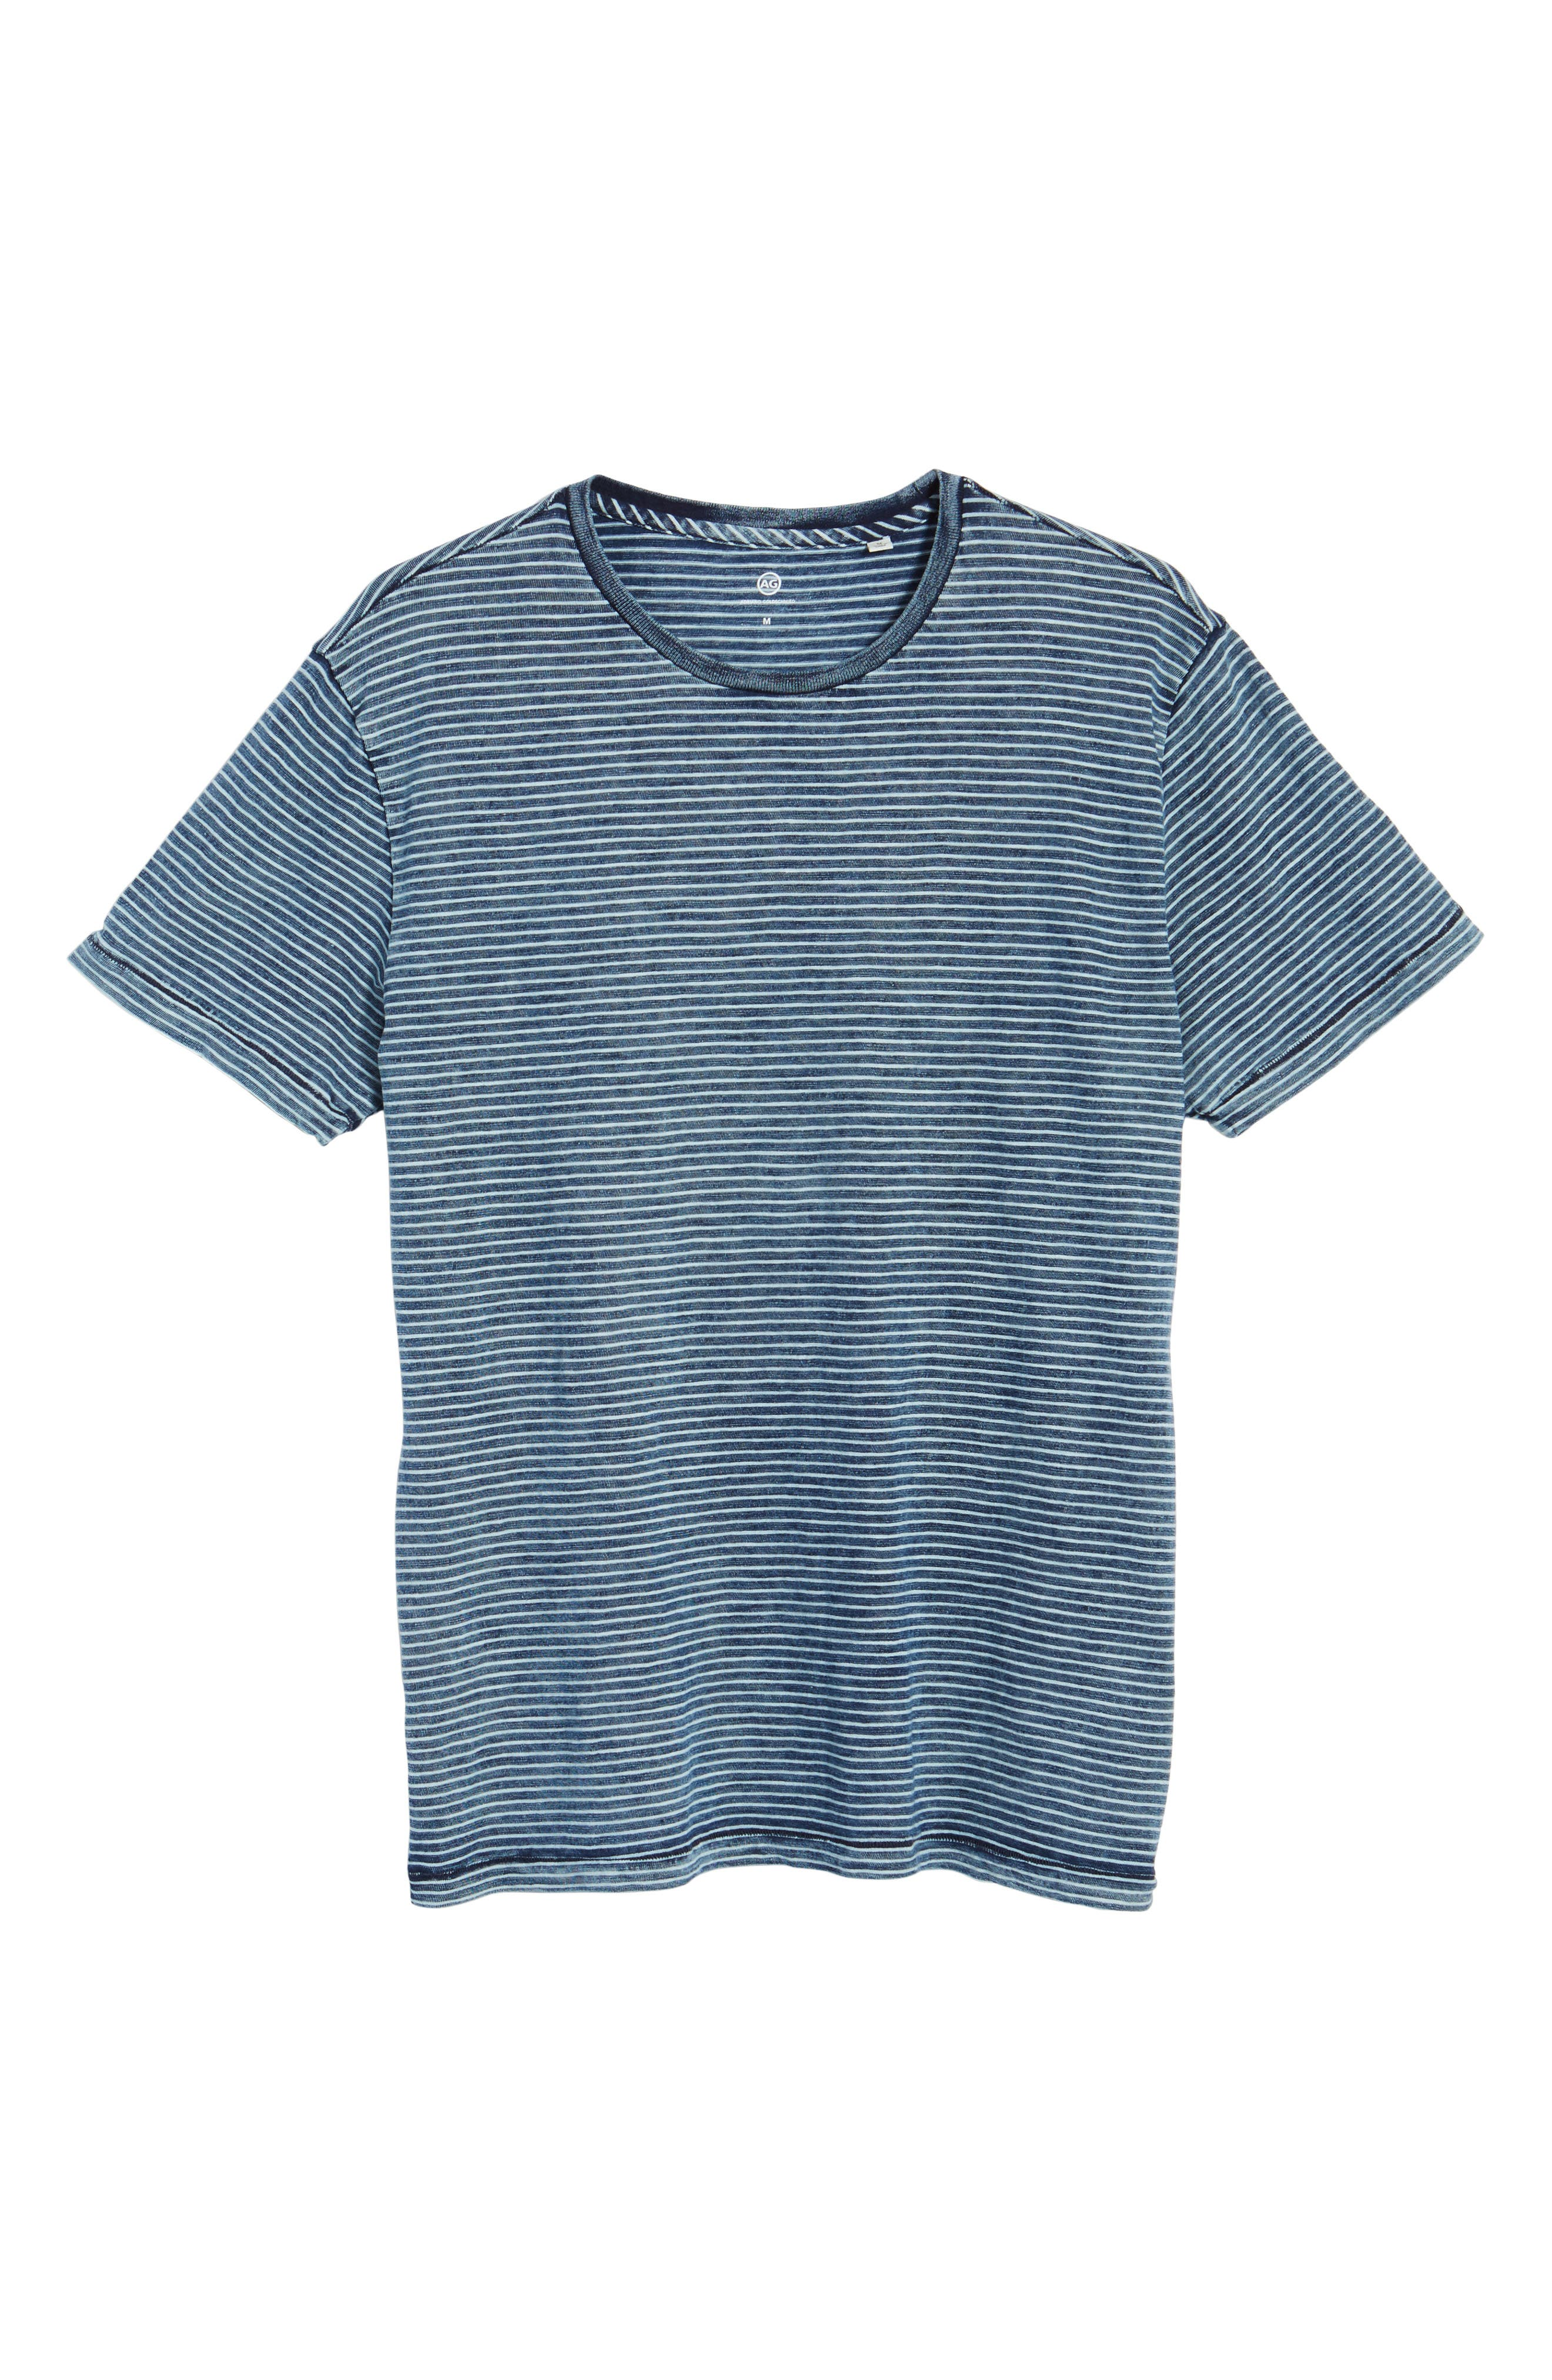 Julian Slim Fit Crewneck Shirt,                             Alternate thumbnail 6, color,                             Marbled Indigo/ White Stripe